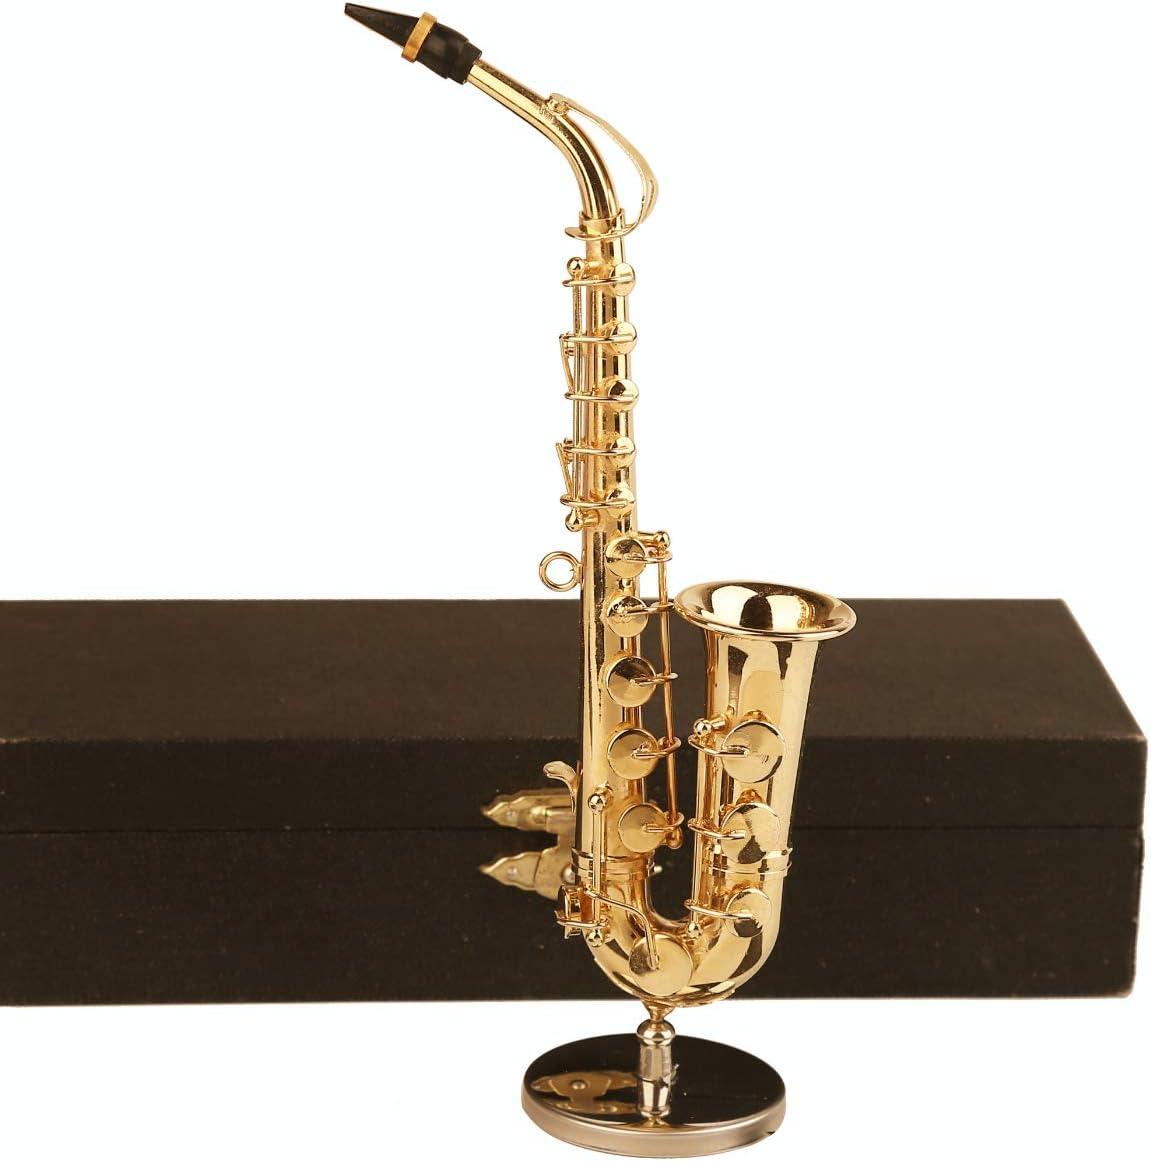 "Dselvgvu Copper Miniature Saxophone with Stand and Case Mini Musical Instrument Miniature Dollhouse Model Mini Alto Saxophone Tenor Saxophone Home Decoration (Alto Saxophone, 6.22""x3.07""x1.12"")"